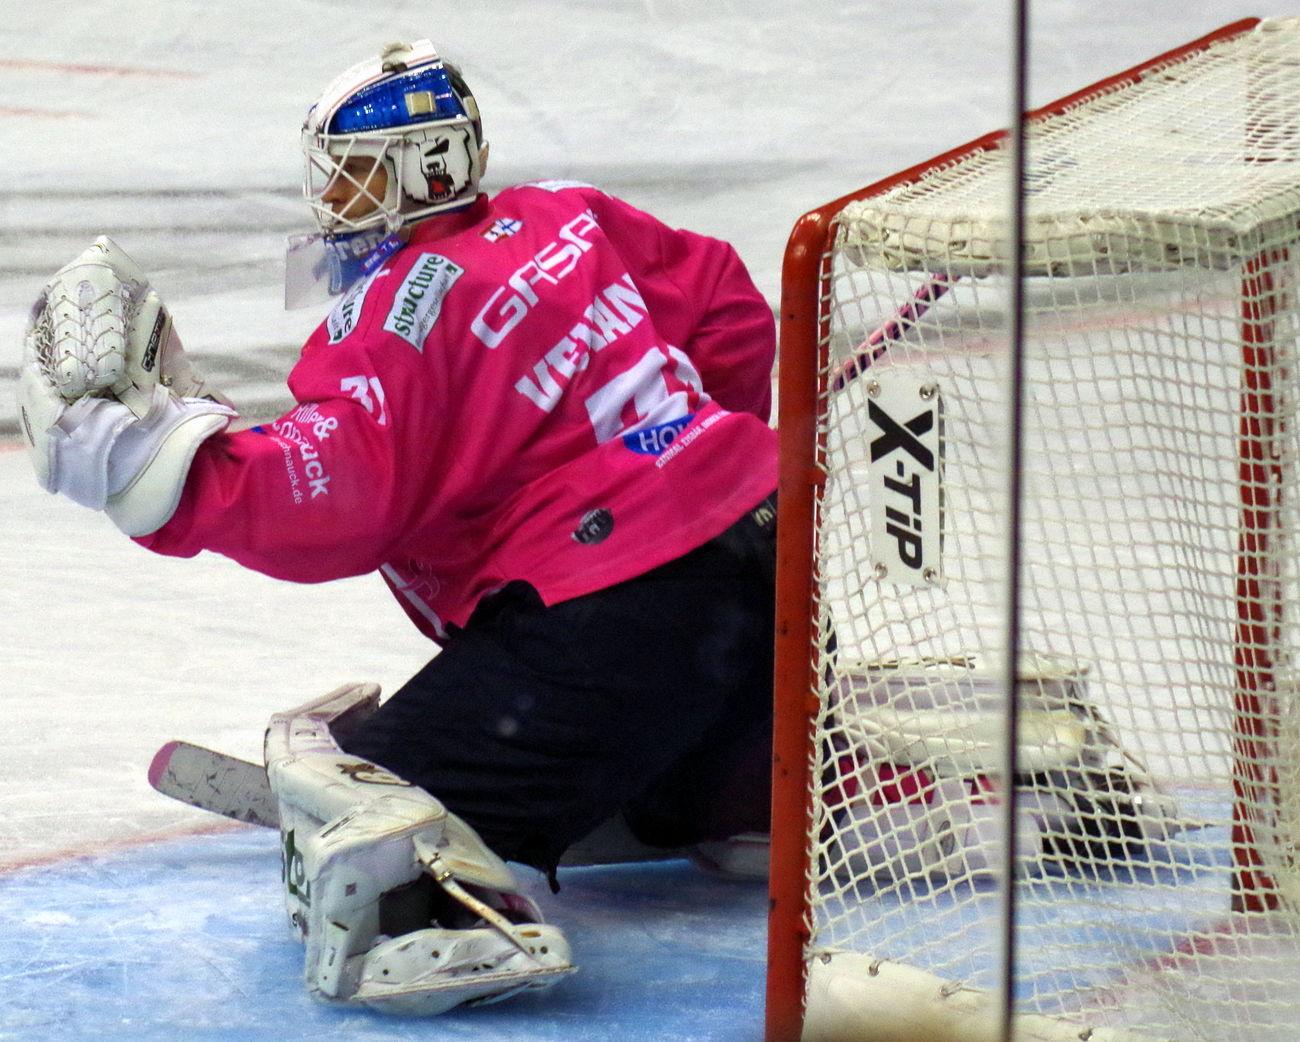 Eisbären Berlin ... PINK in the RINK ... Aktion gegen Brustkrebs Eisbären Berlin Eishockey Ice Ice Age Keeper Person Pink PINK Of The RINK The Color Of Sport Torwart